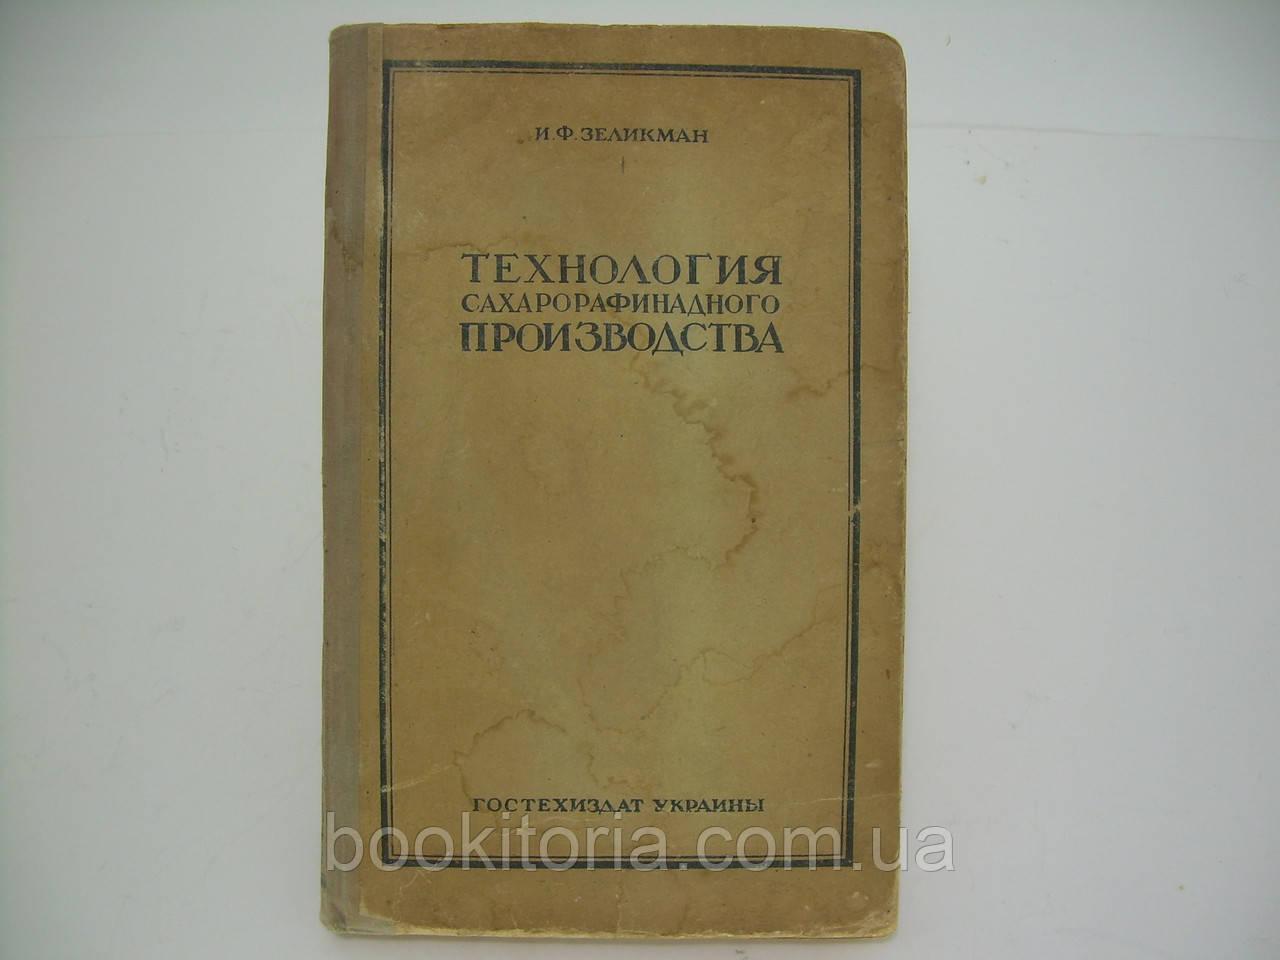 Зеликман И.Ф. Технология сахарорафинадного производства (б/у).